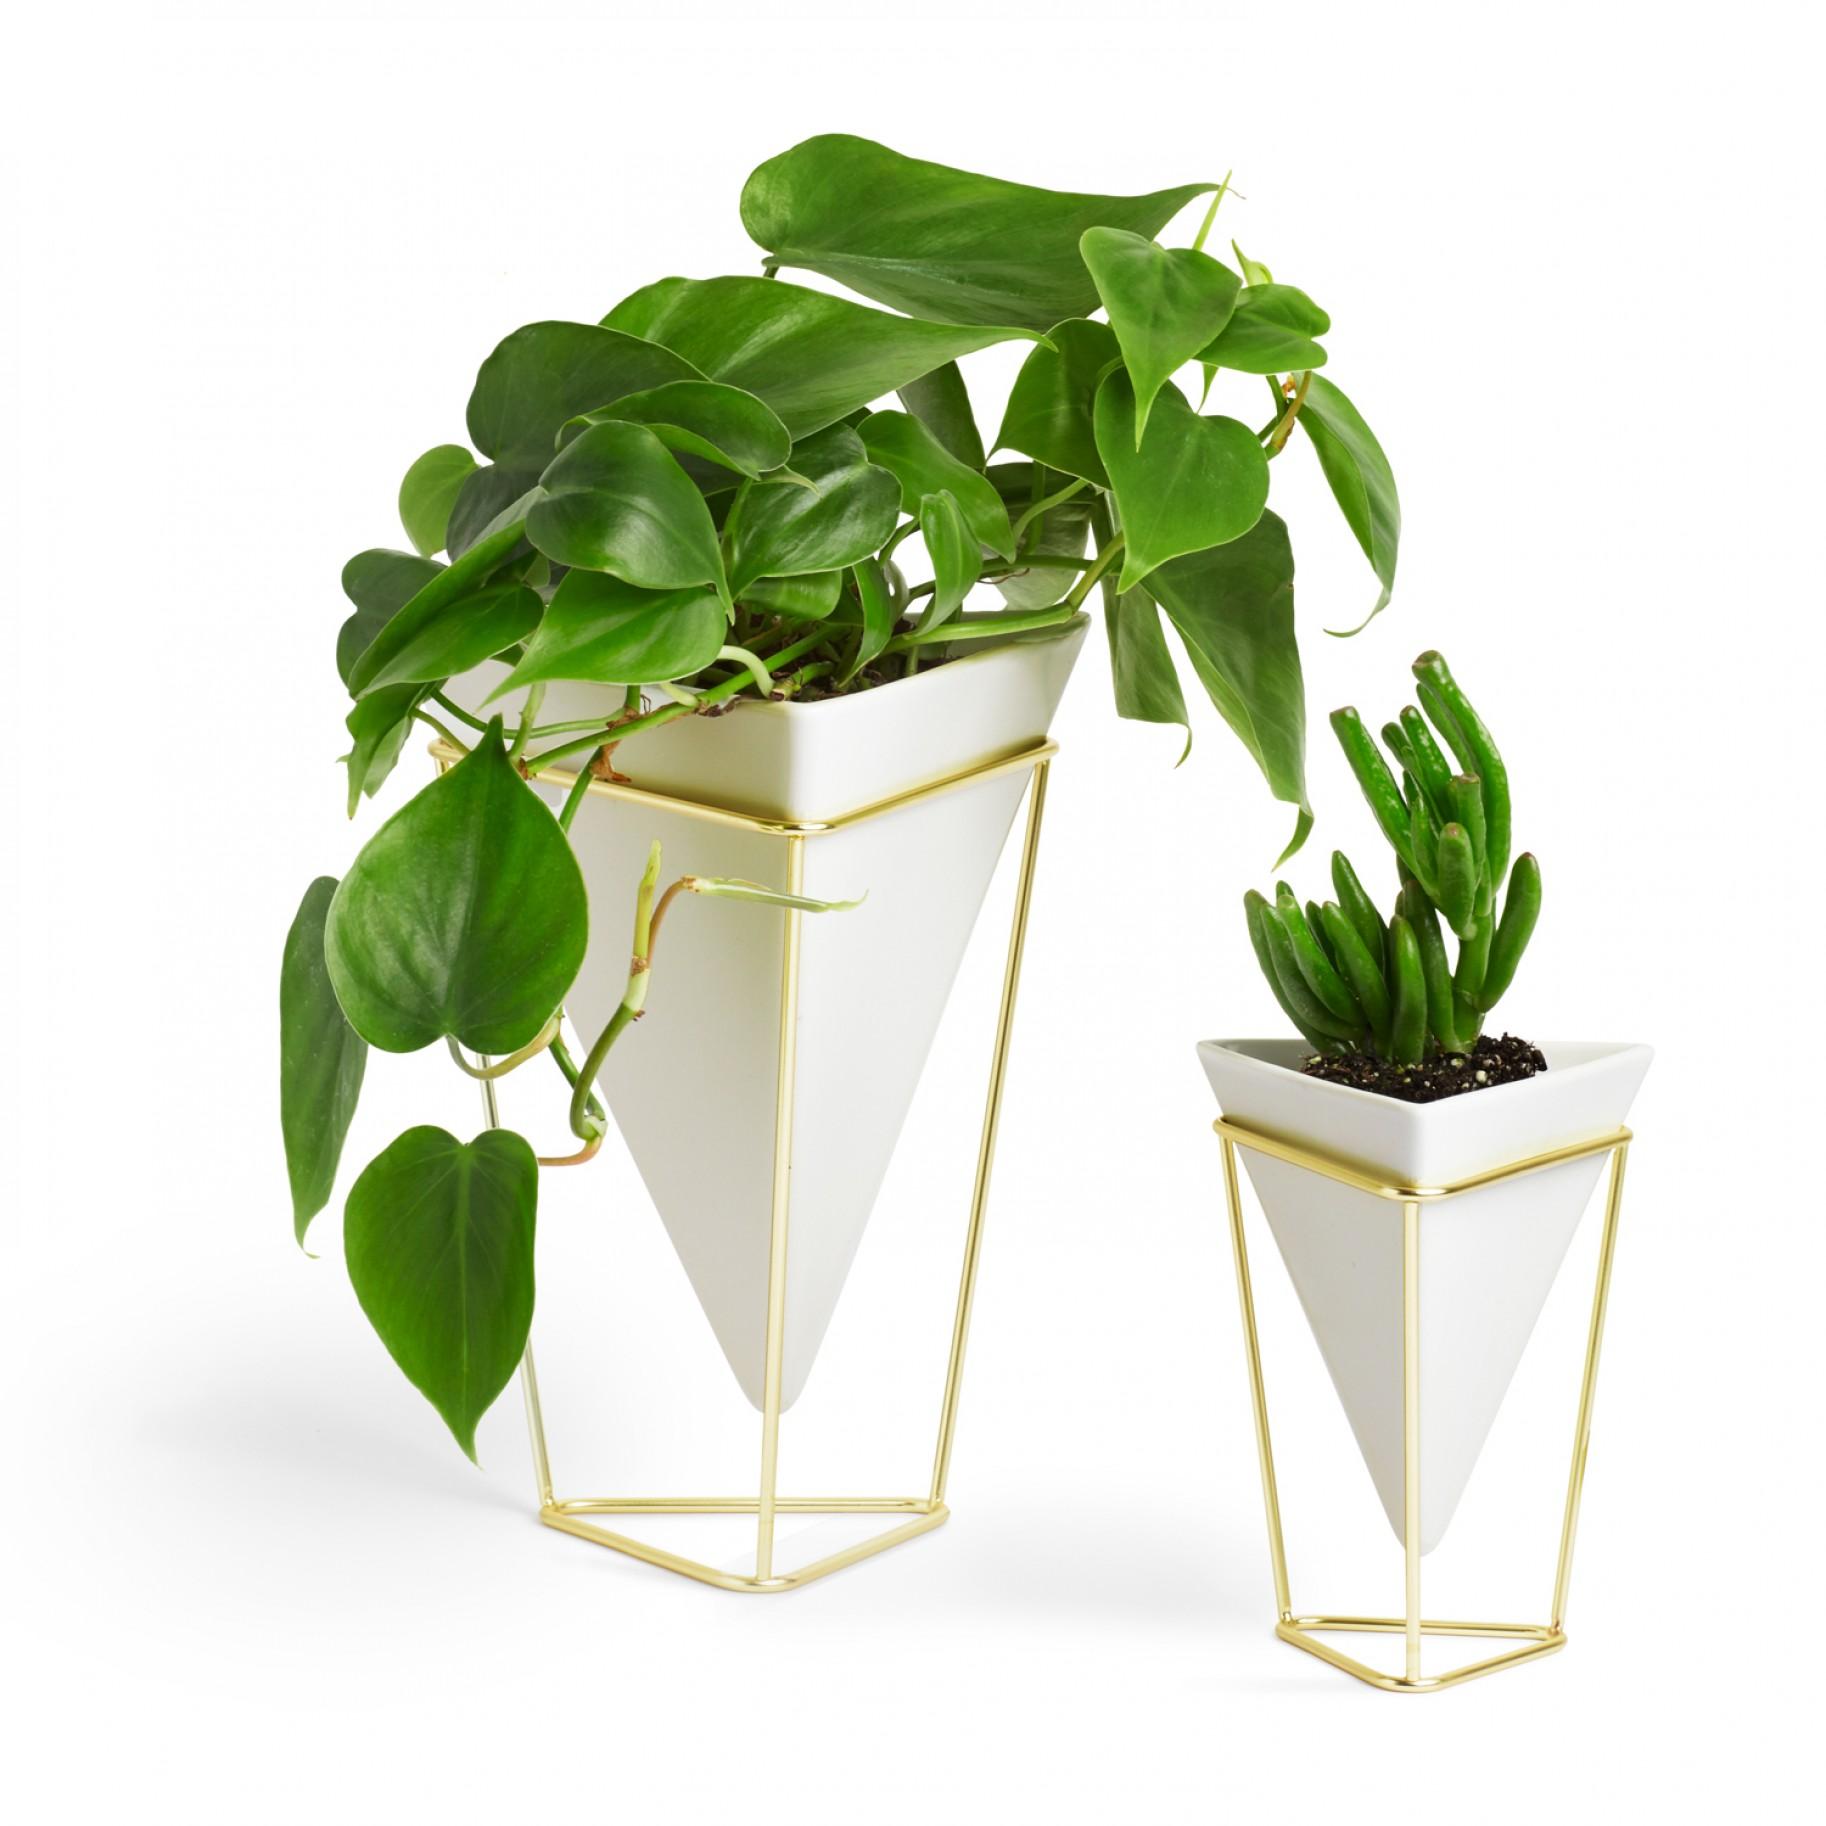 Vases-design-Trigg-Umbra-01